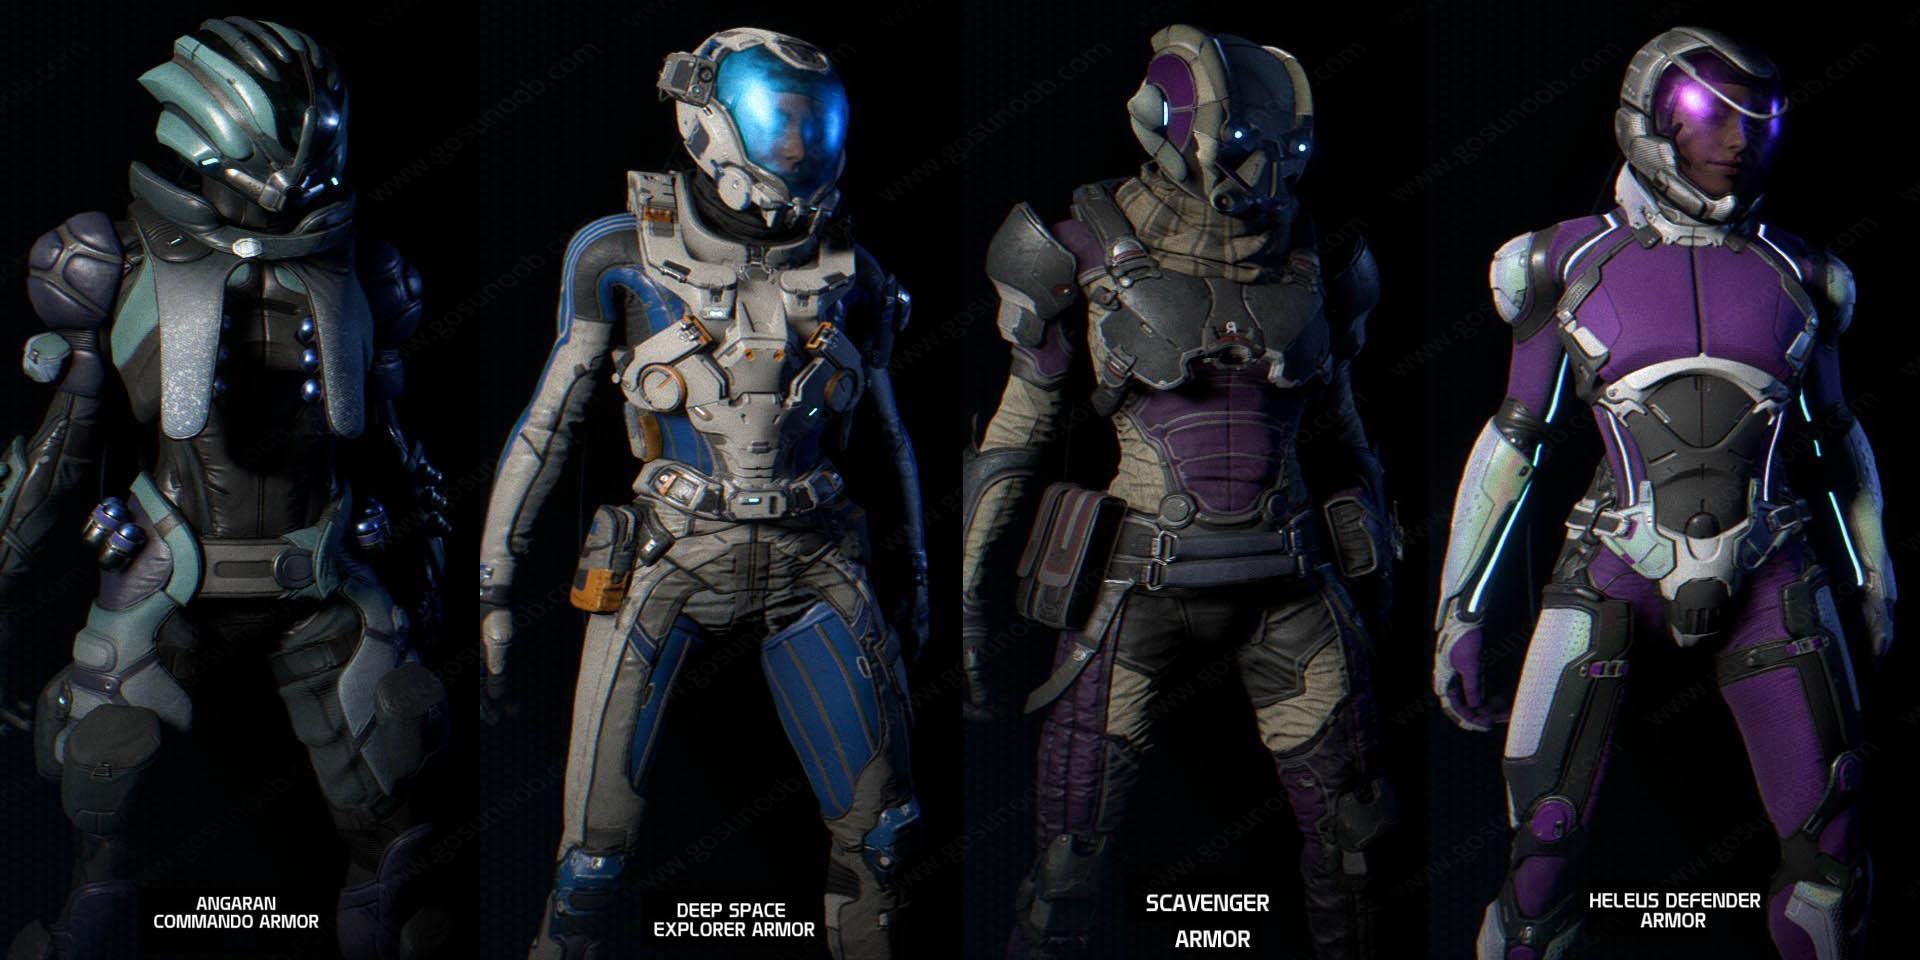 Pistol 3d Wallpaper Mass Effect Andromeda Best Armor Stats Amp How To Get